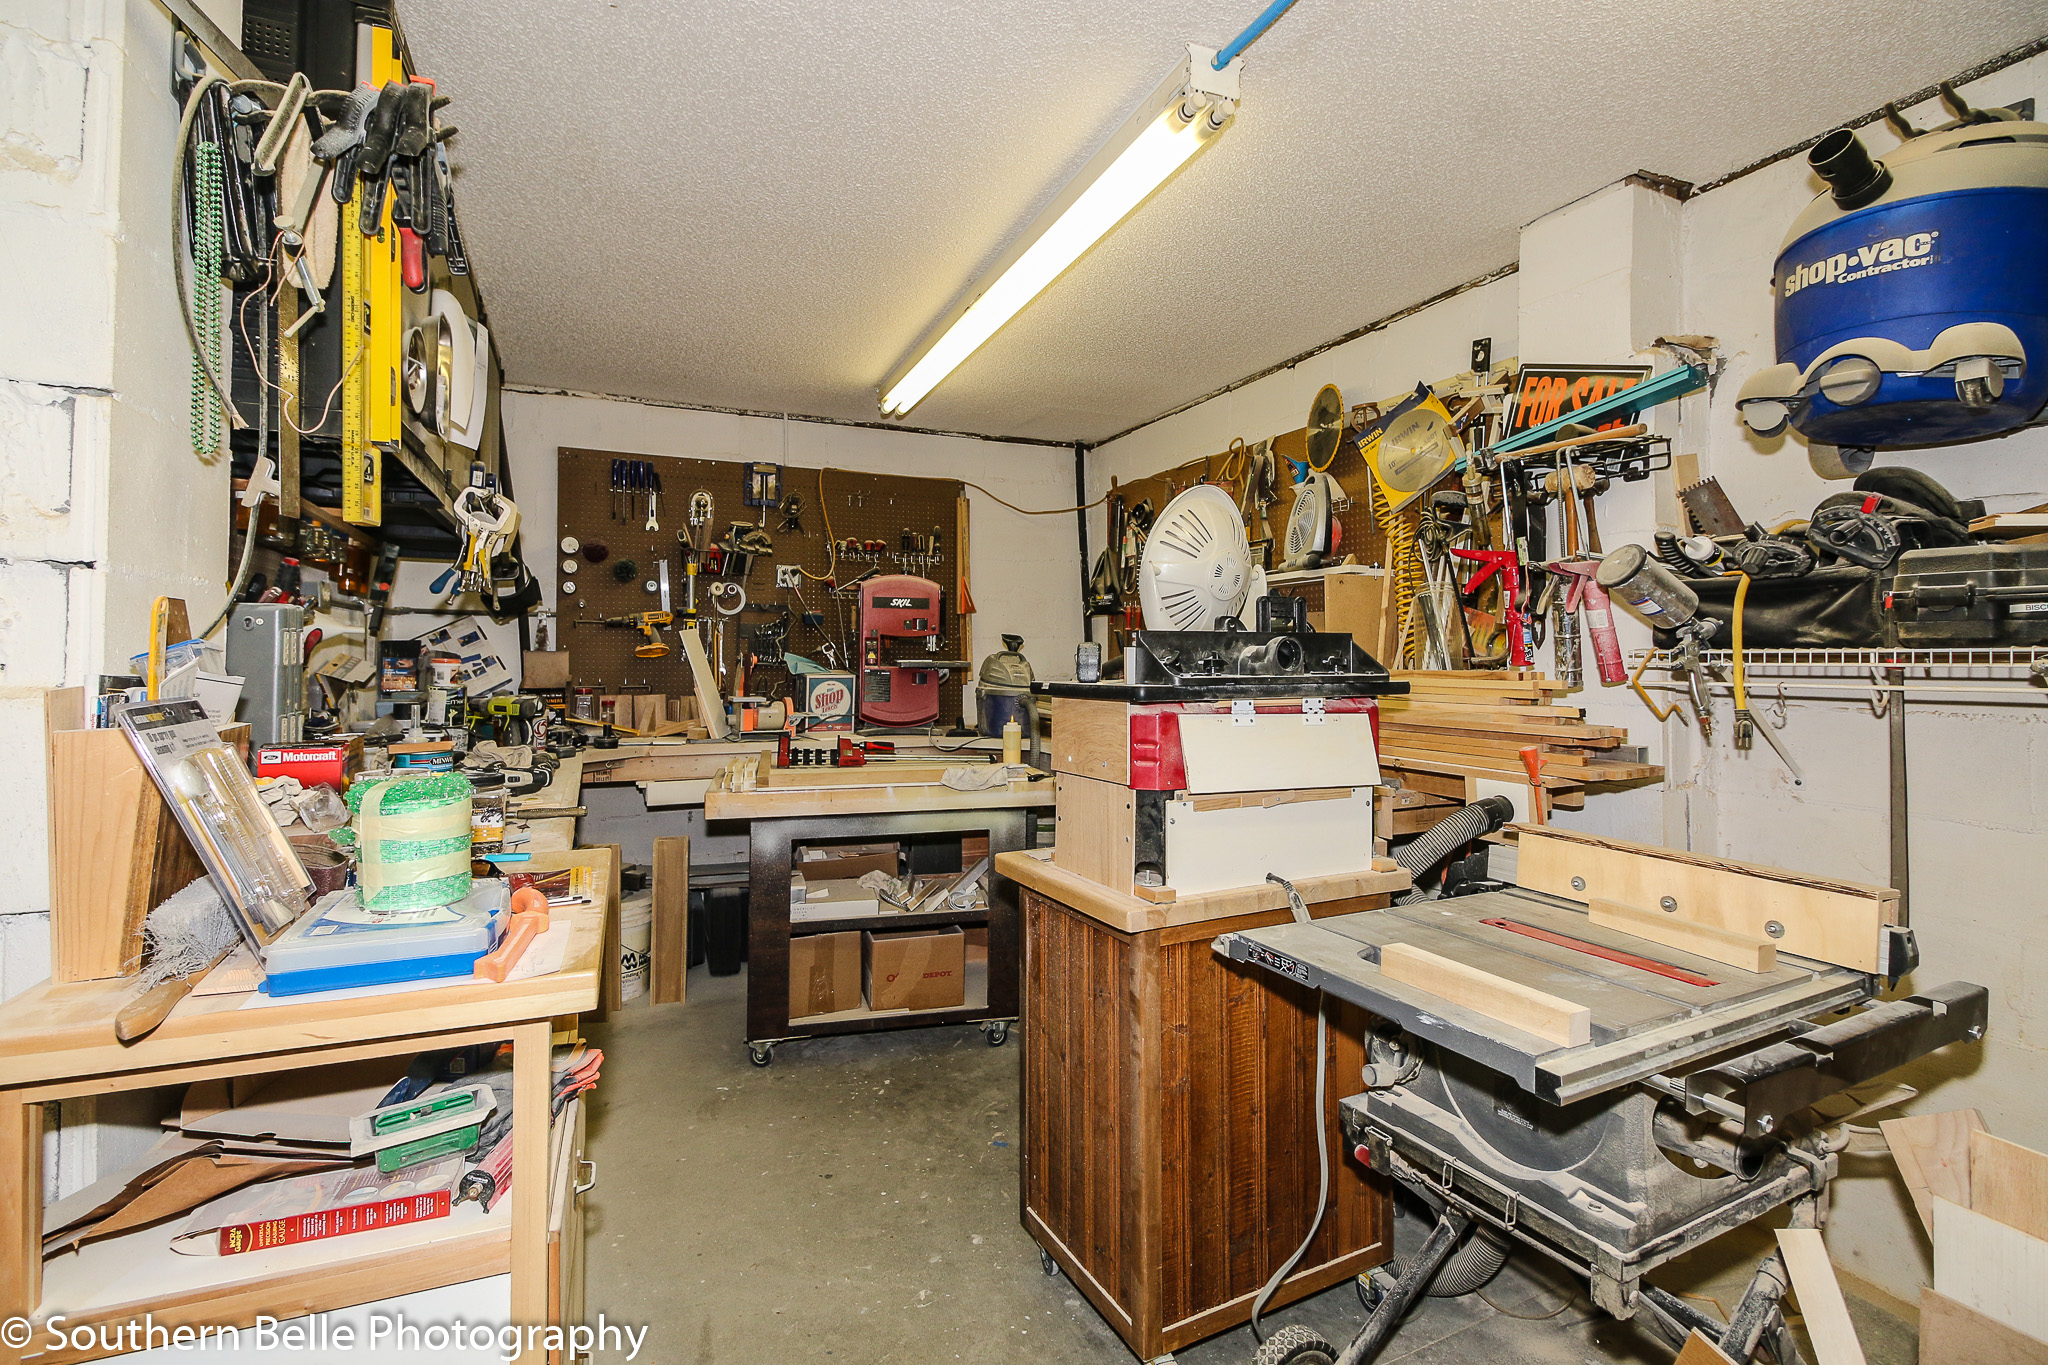 22. Workshop in basement WM